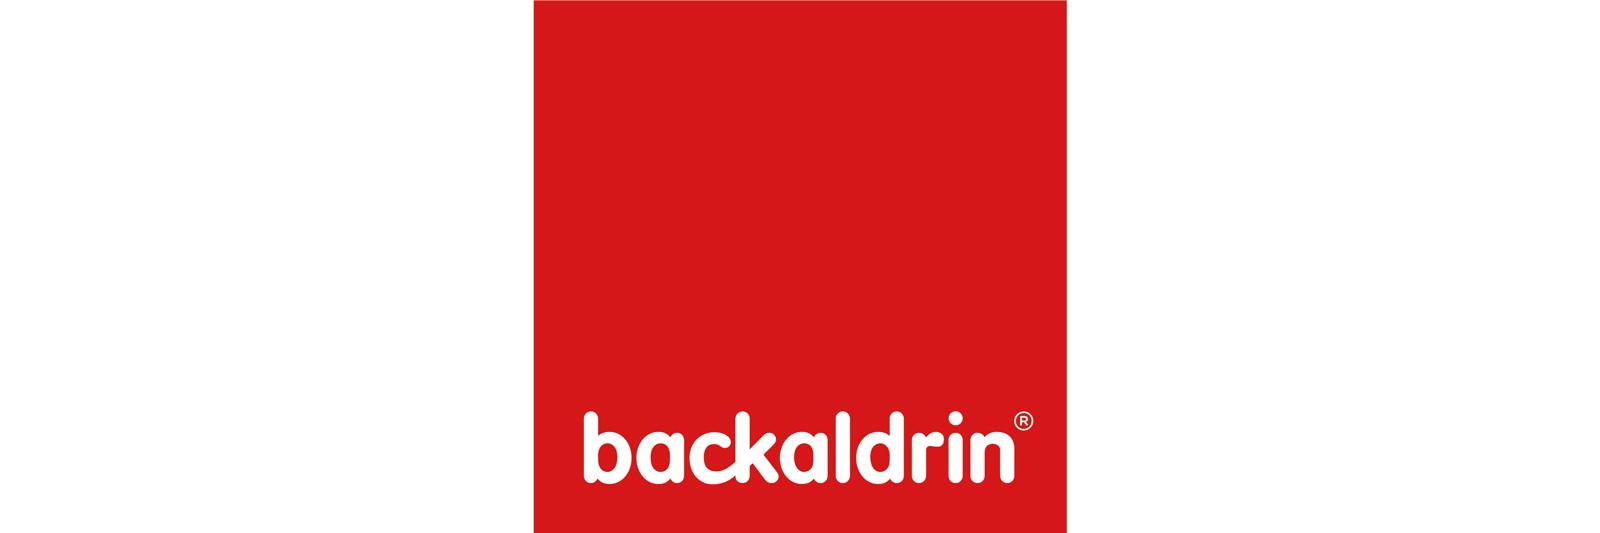 backaldrin_2